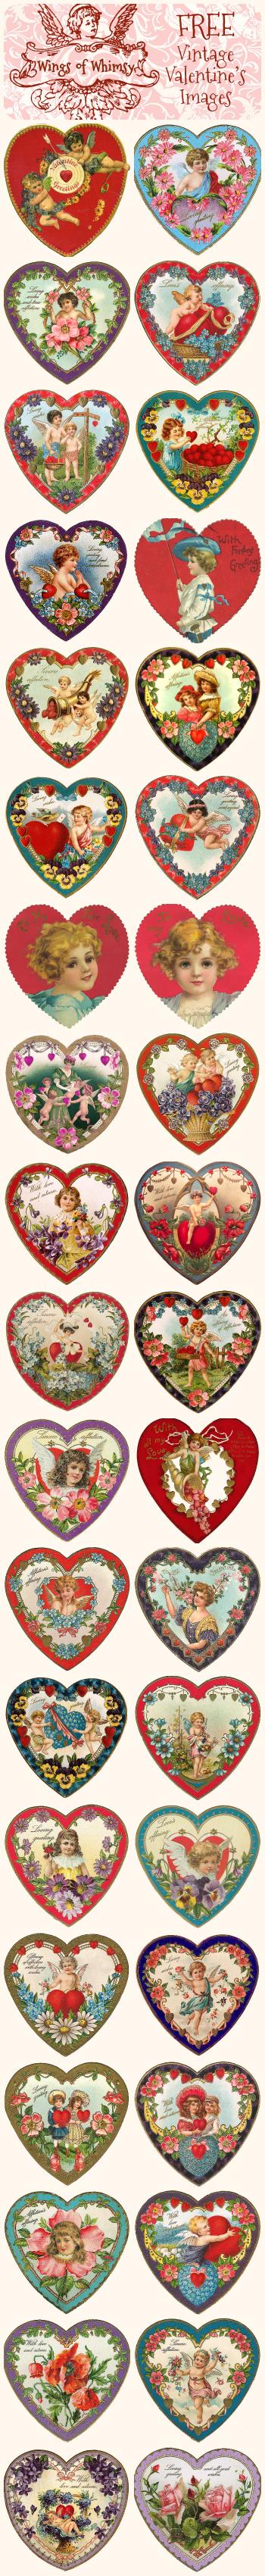 Wings of Whimsy: Valentine Hearts - free for personal use #vintage #ephemera #printable #freebie #valentine #cherub #heart